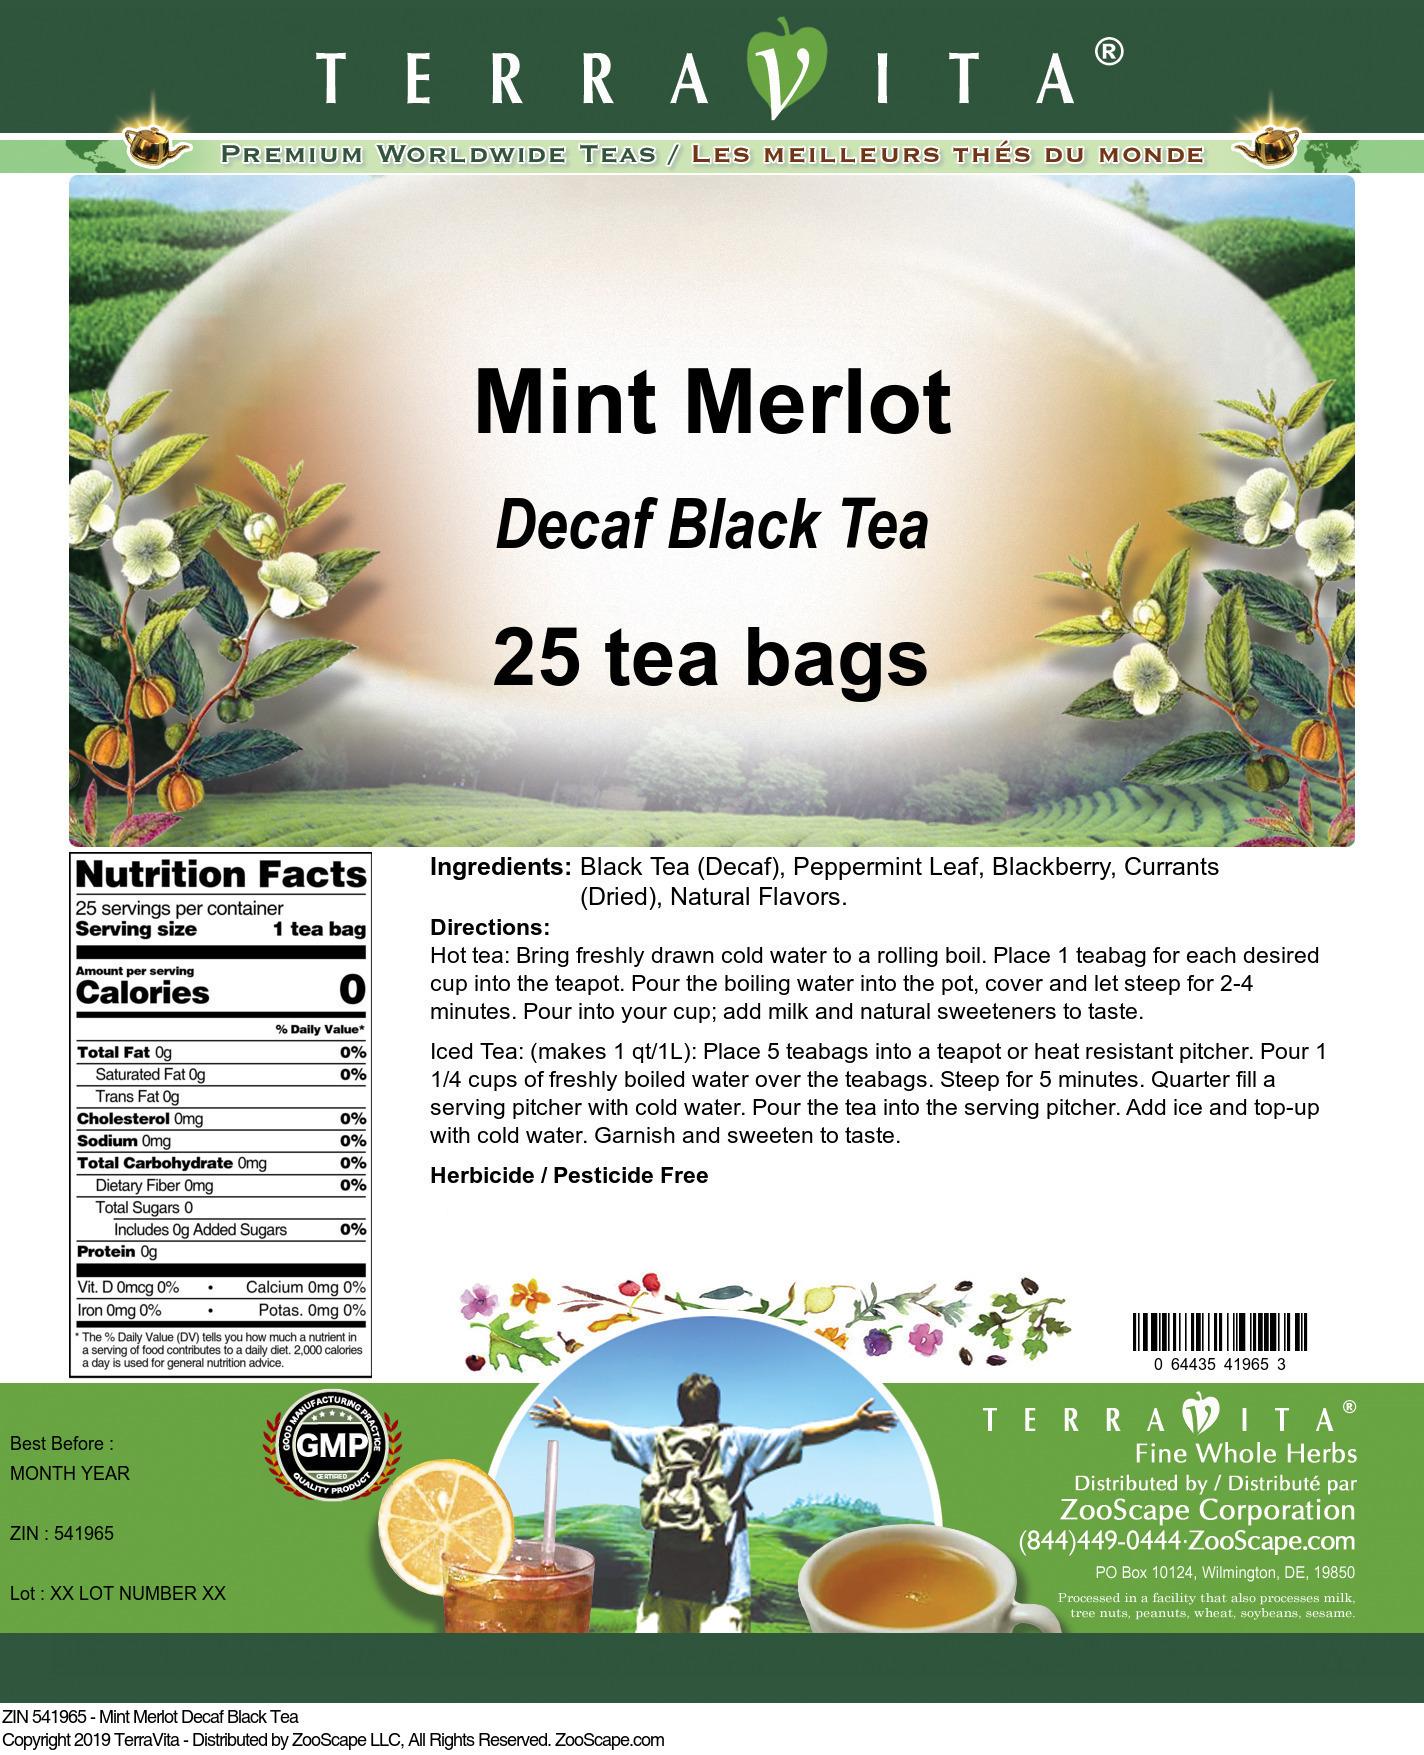 Mint Merlot Decaf Black Tea